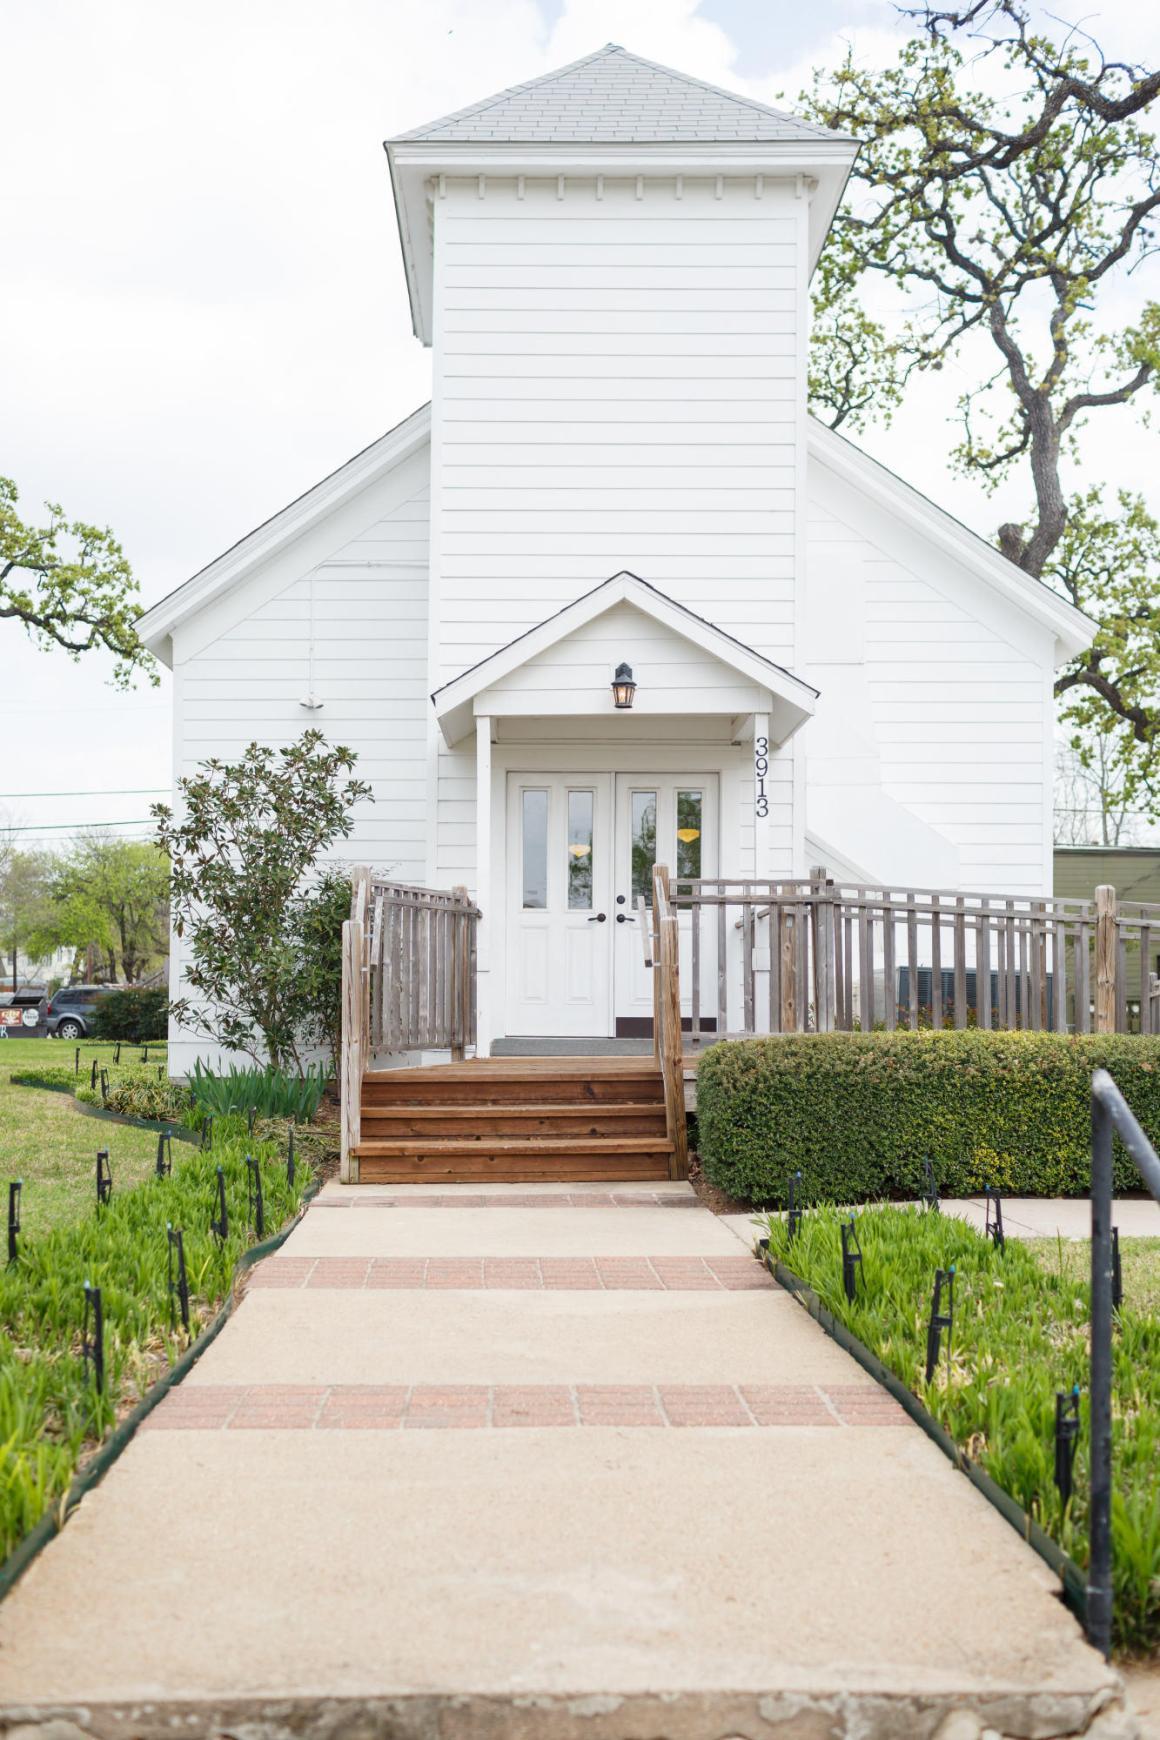 Joshua and Brittany Wedding -Hyde Park Presbyterian Church in Austin, TX.